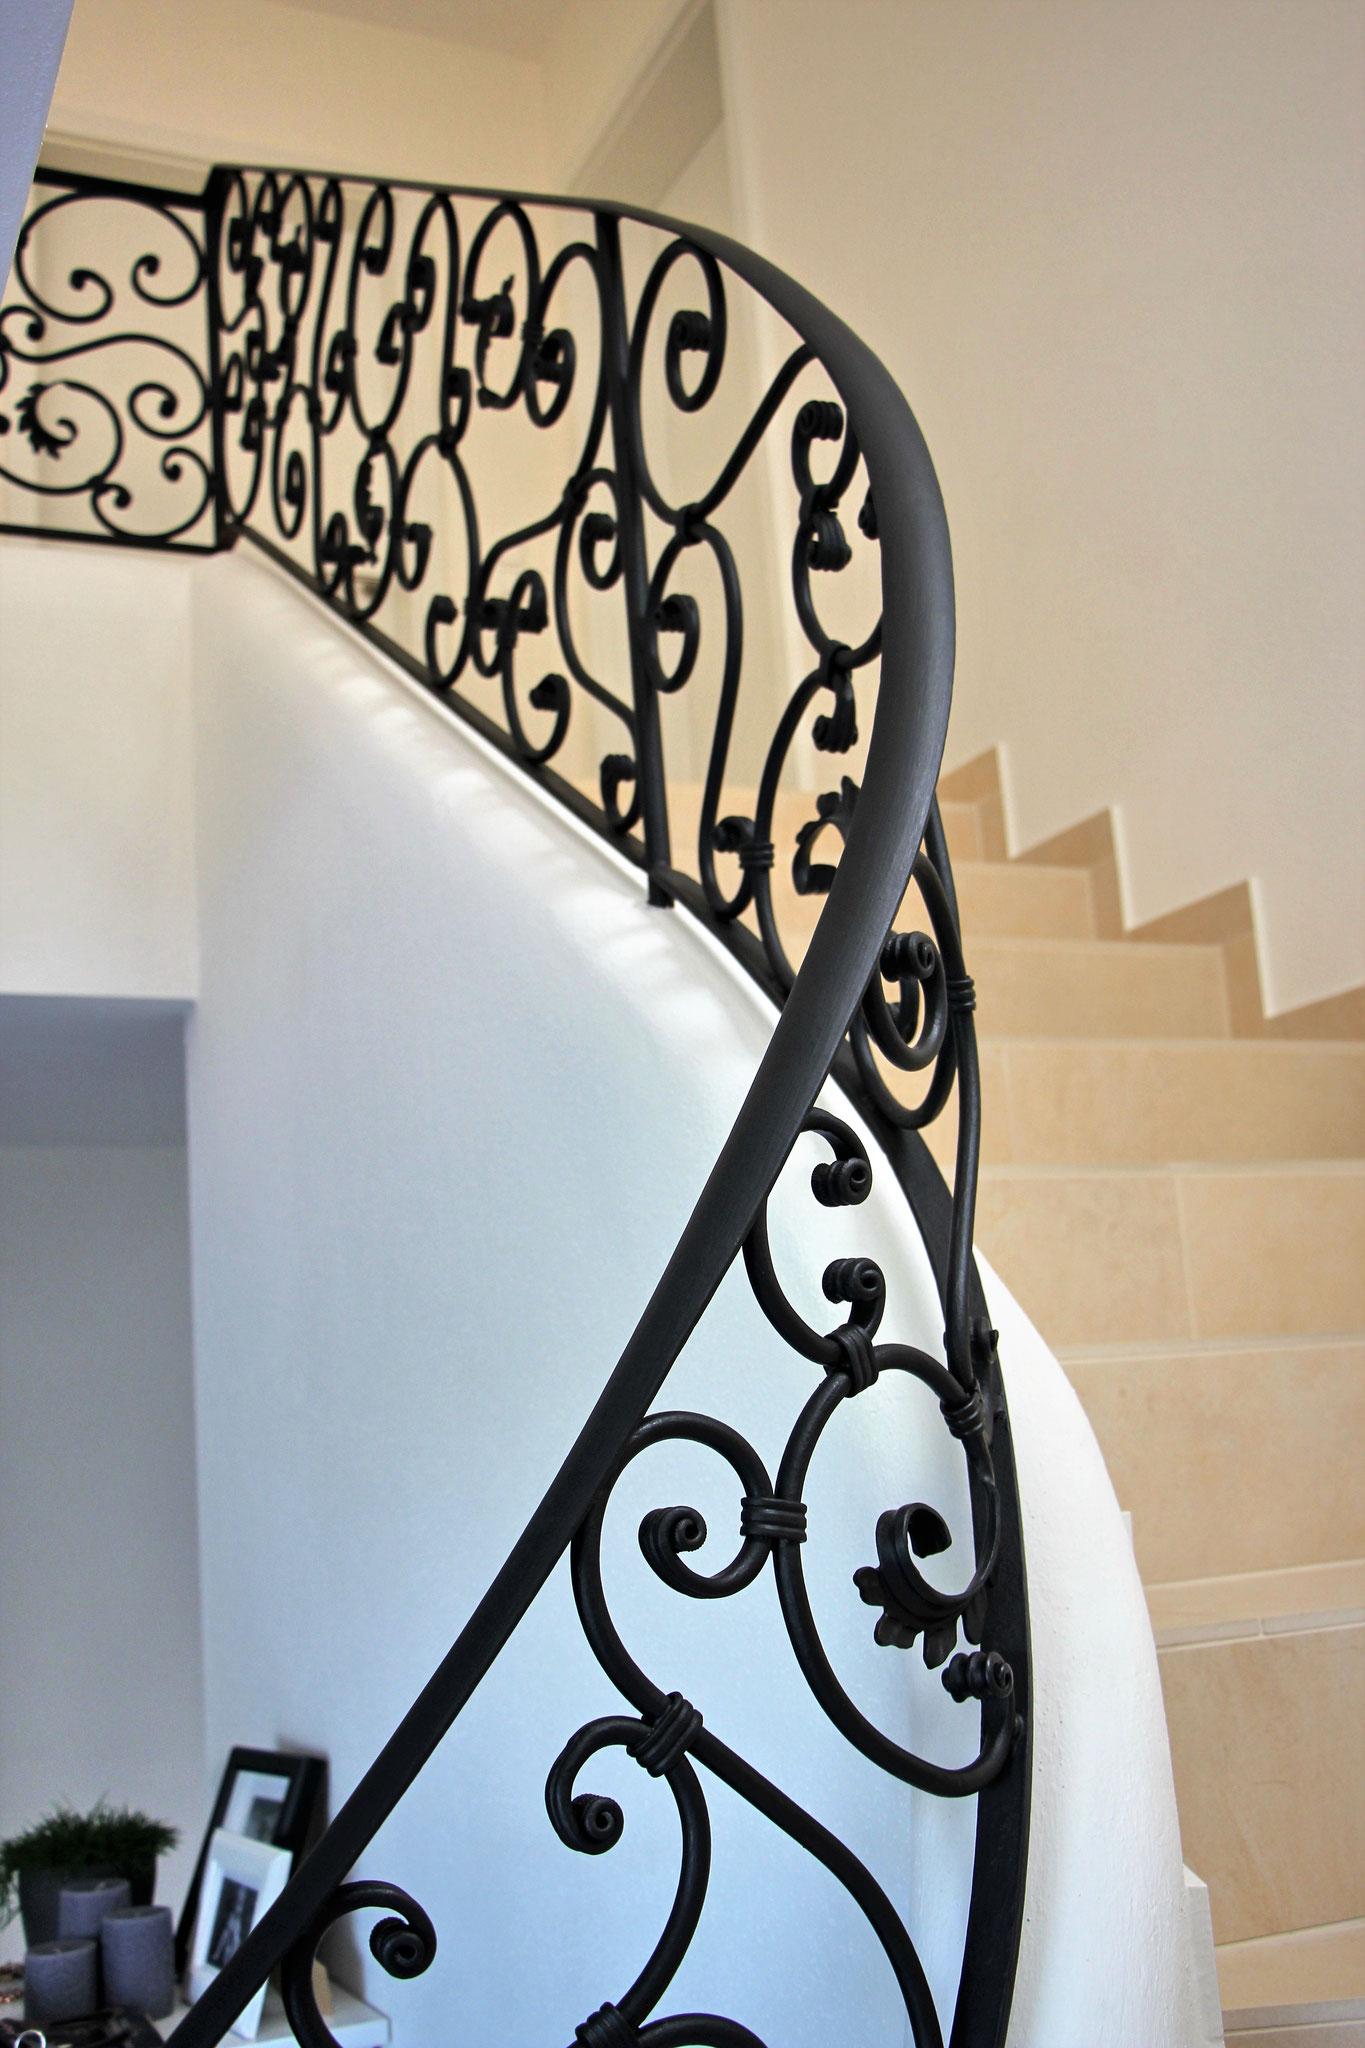 Treppengeländer in verspieltem Barock